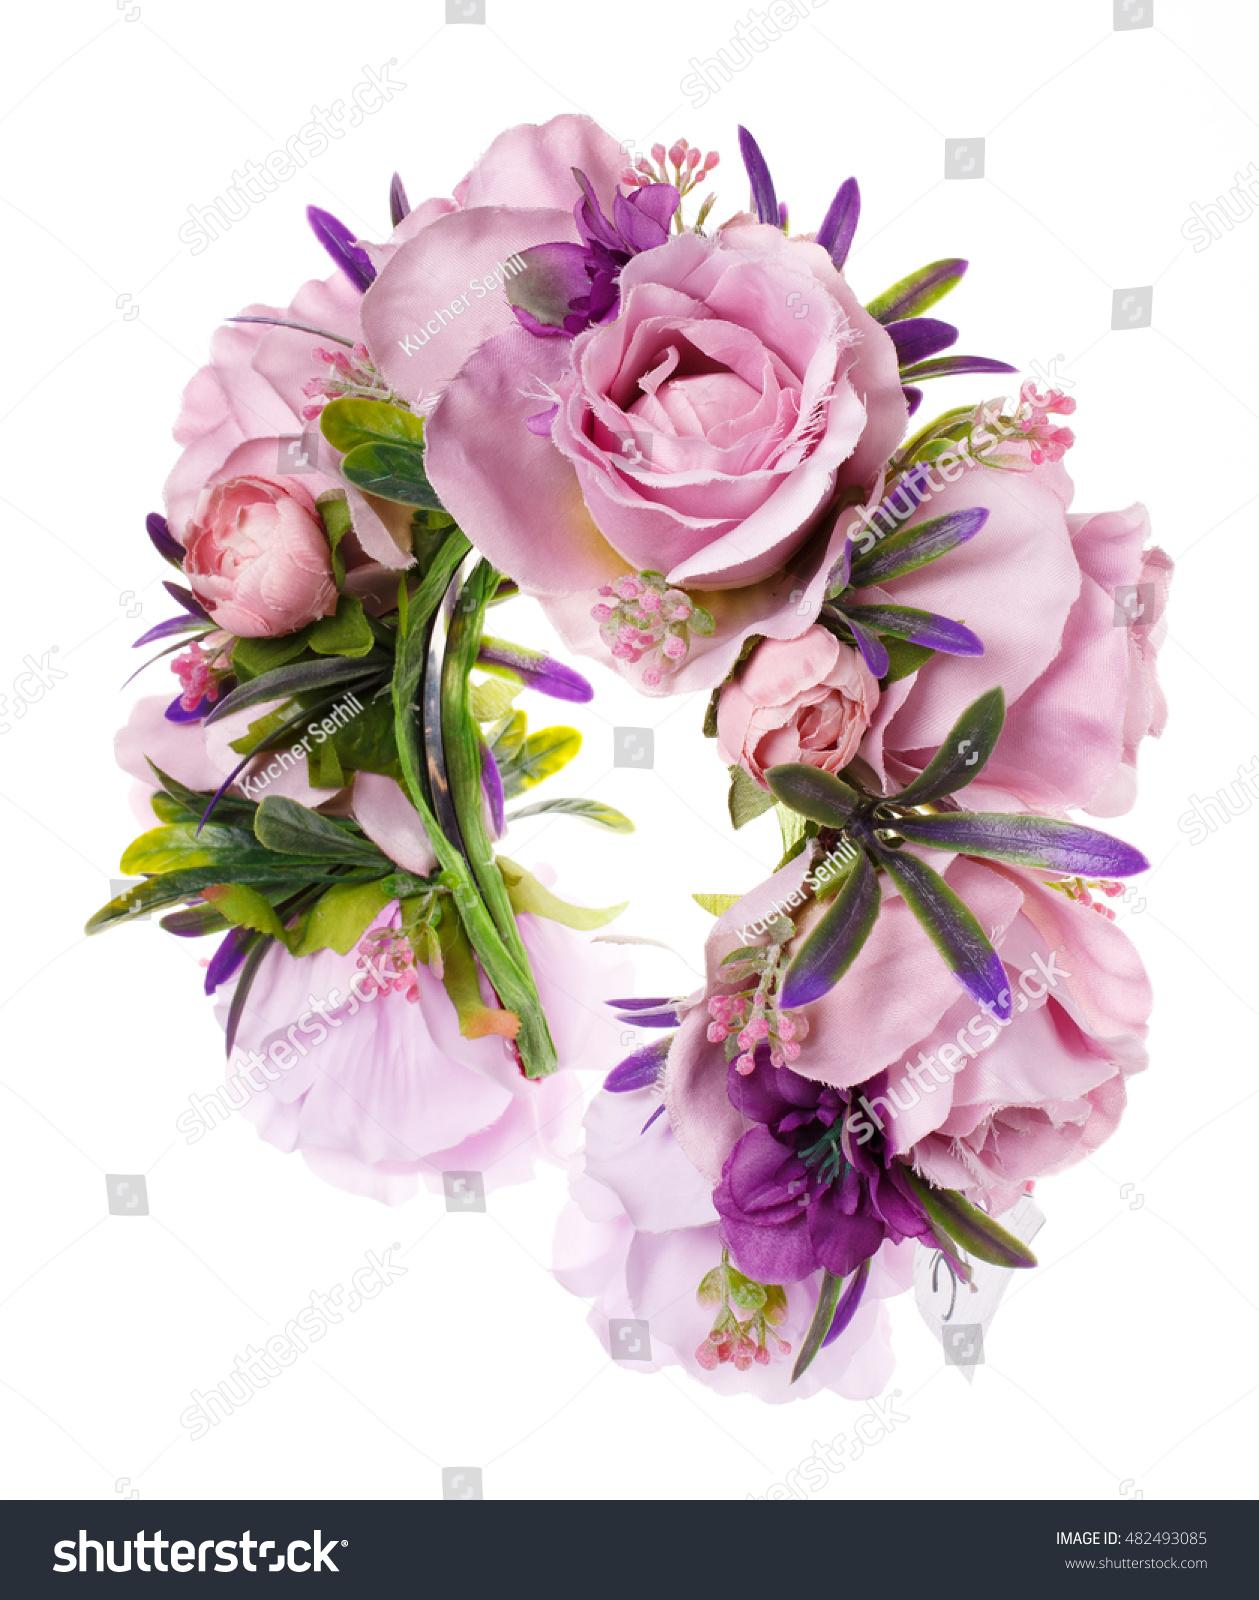 Hoop flowers wreath colored flowers handmade stock photo royalty hoop from flowers wreath with colored flowers handmade flowers wreath on white accessory mightylinksfo